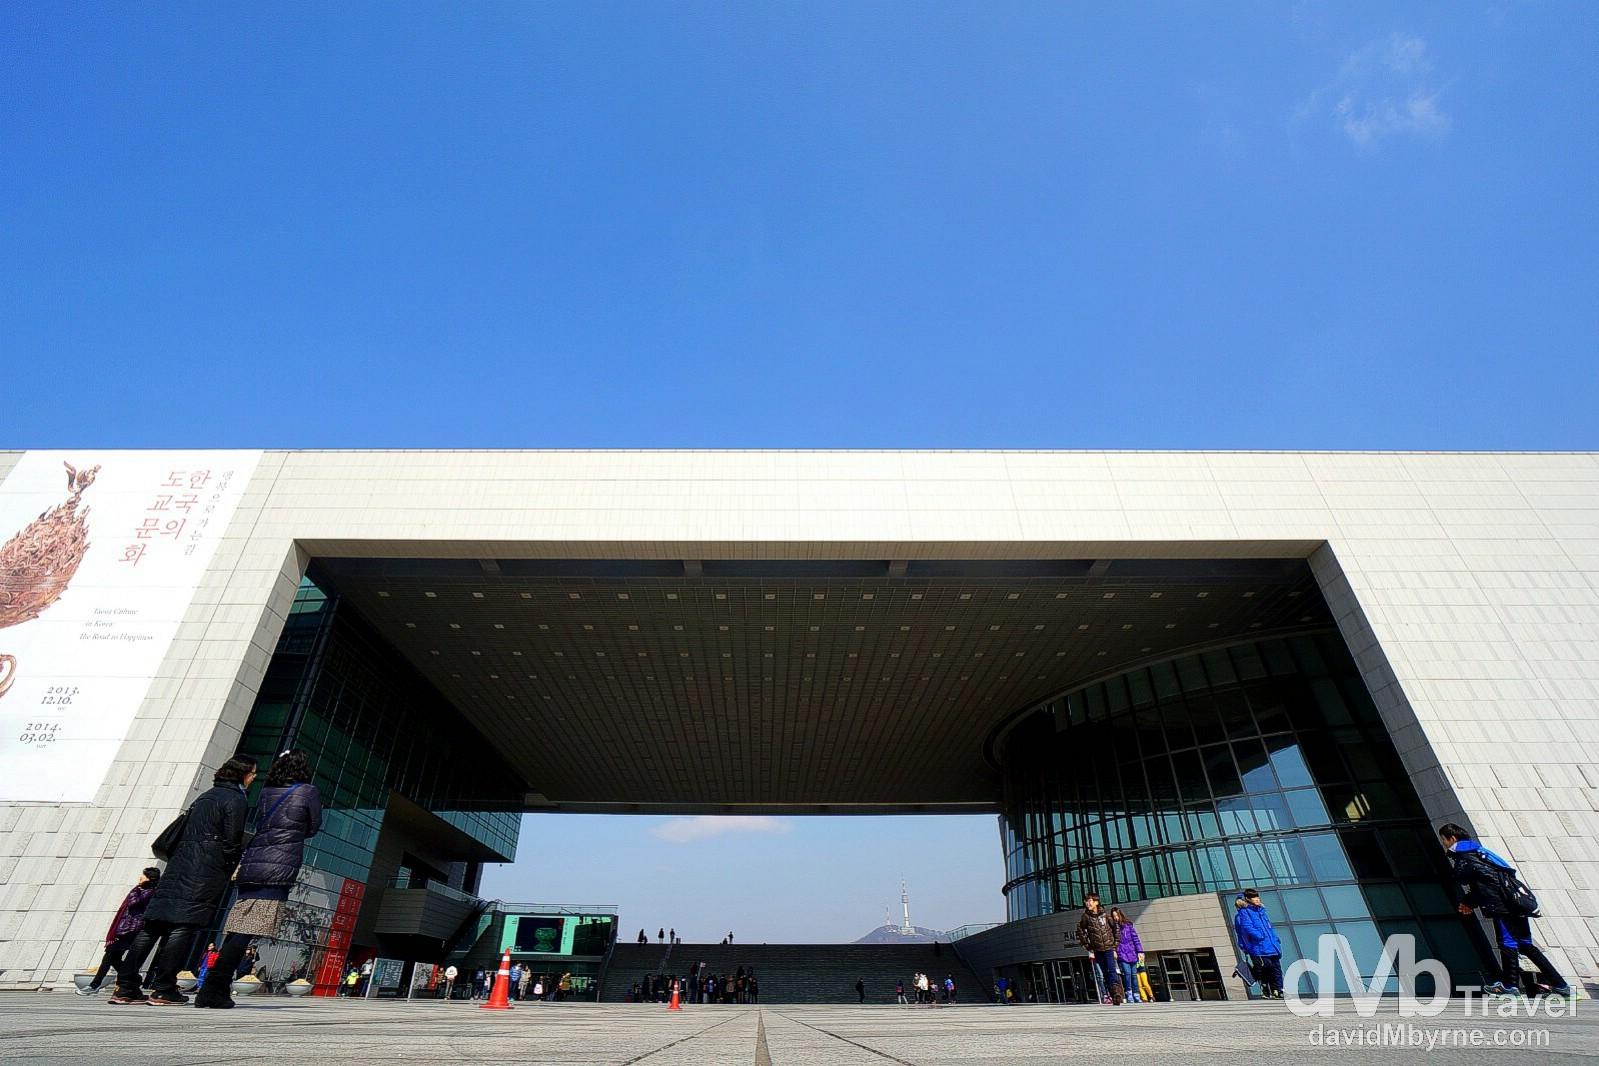 The National Museum of Korea, Yongsan Family Park, Seoul, South Korea. February 15th, 2014.